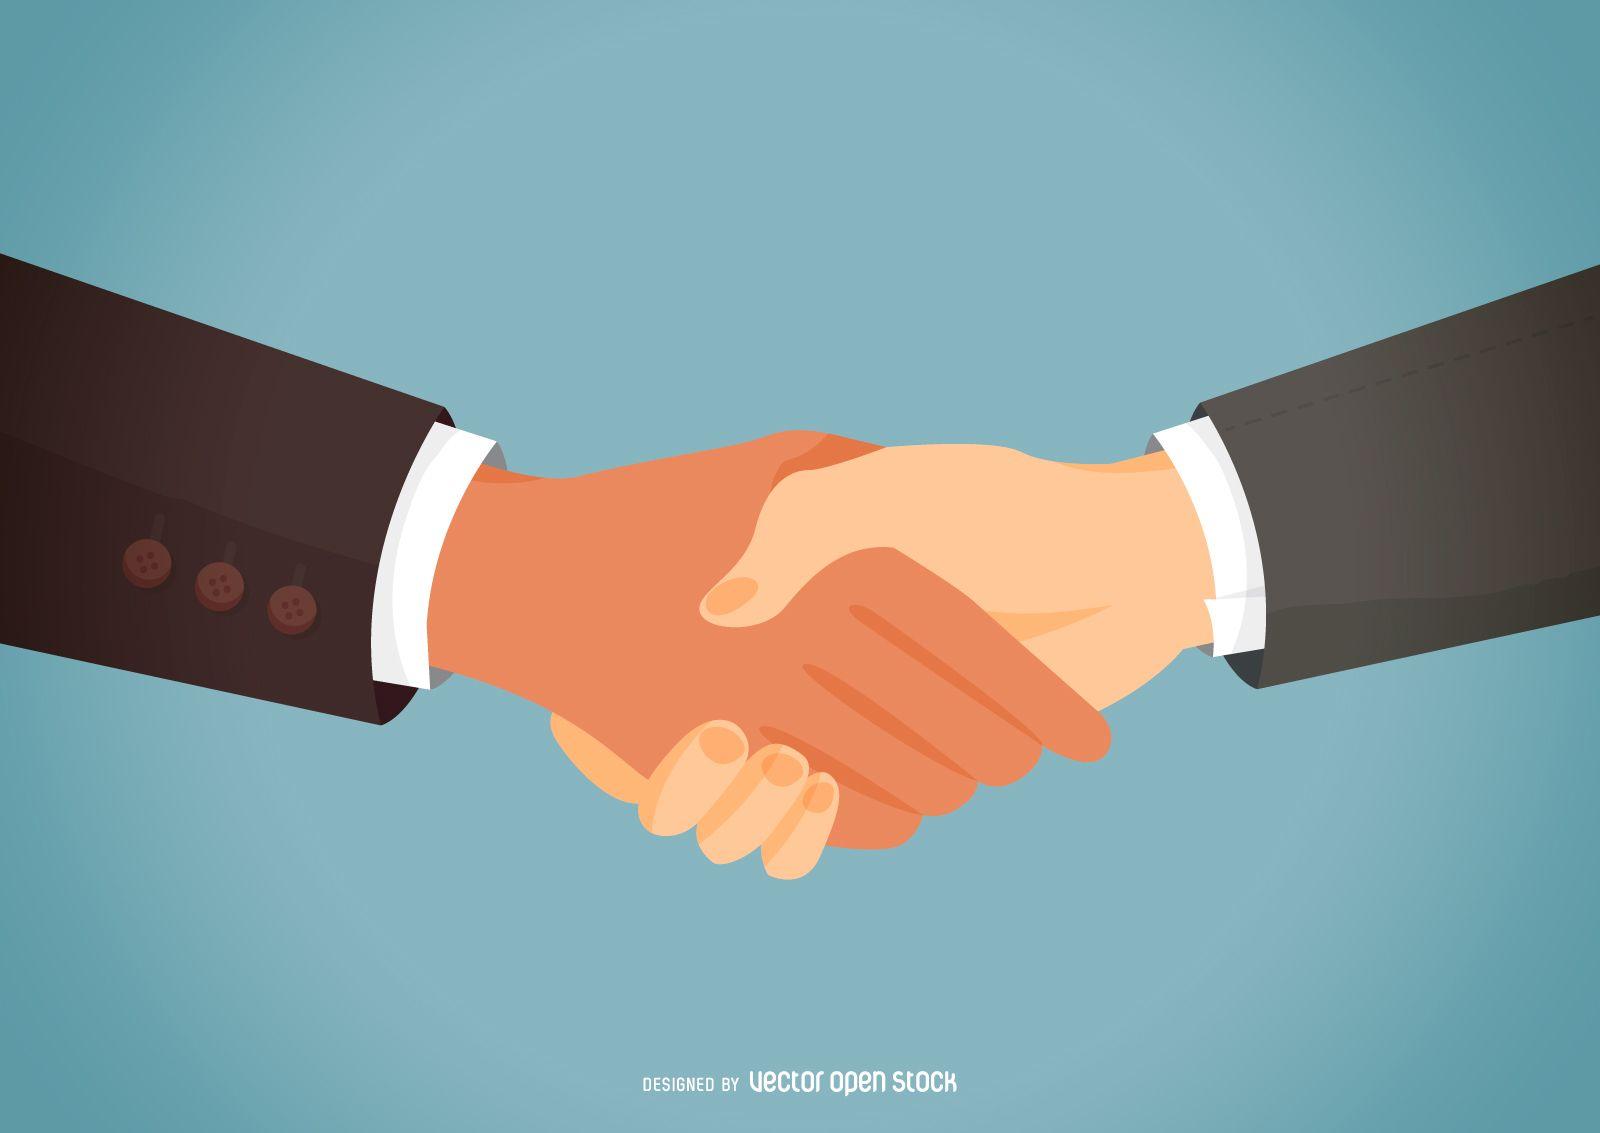 Partner Handshake Flat Illustration Free Vector Flat Illustration Illustration Design Illustration